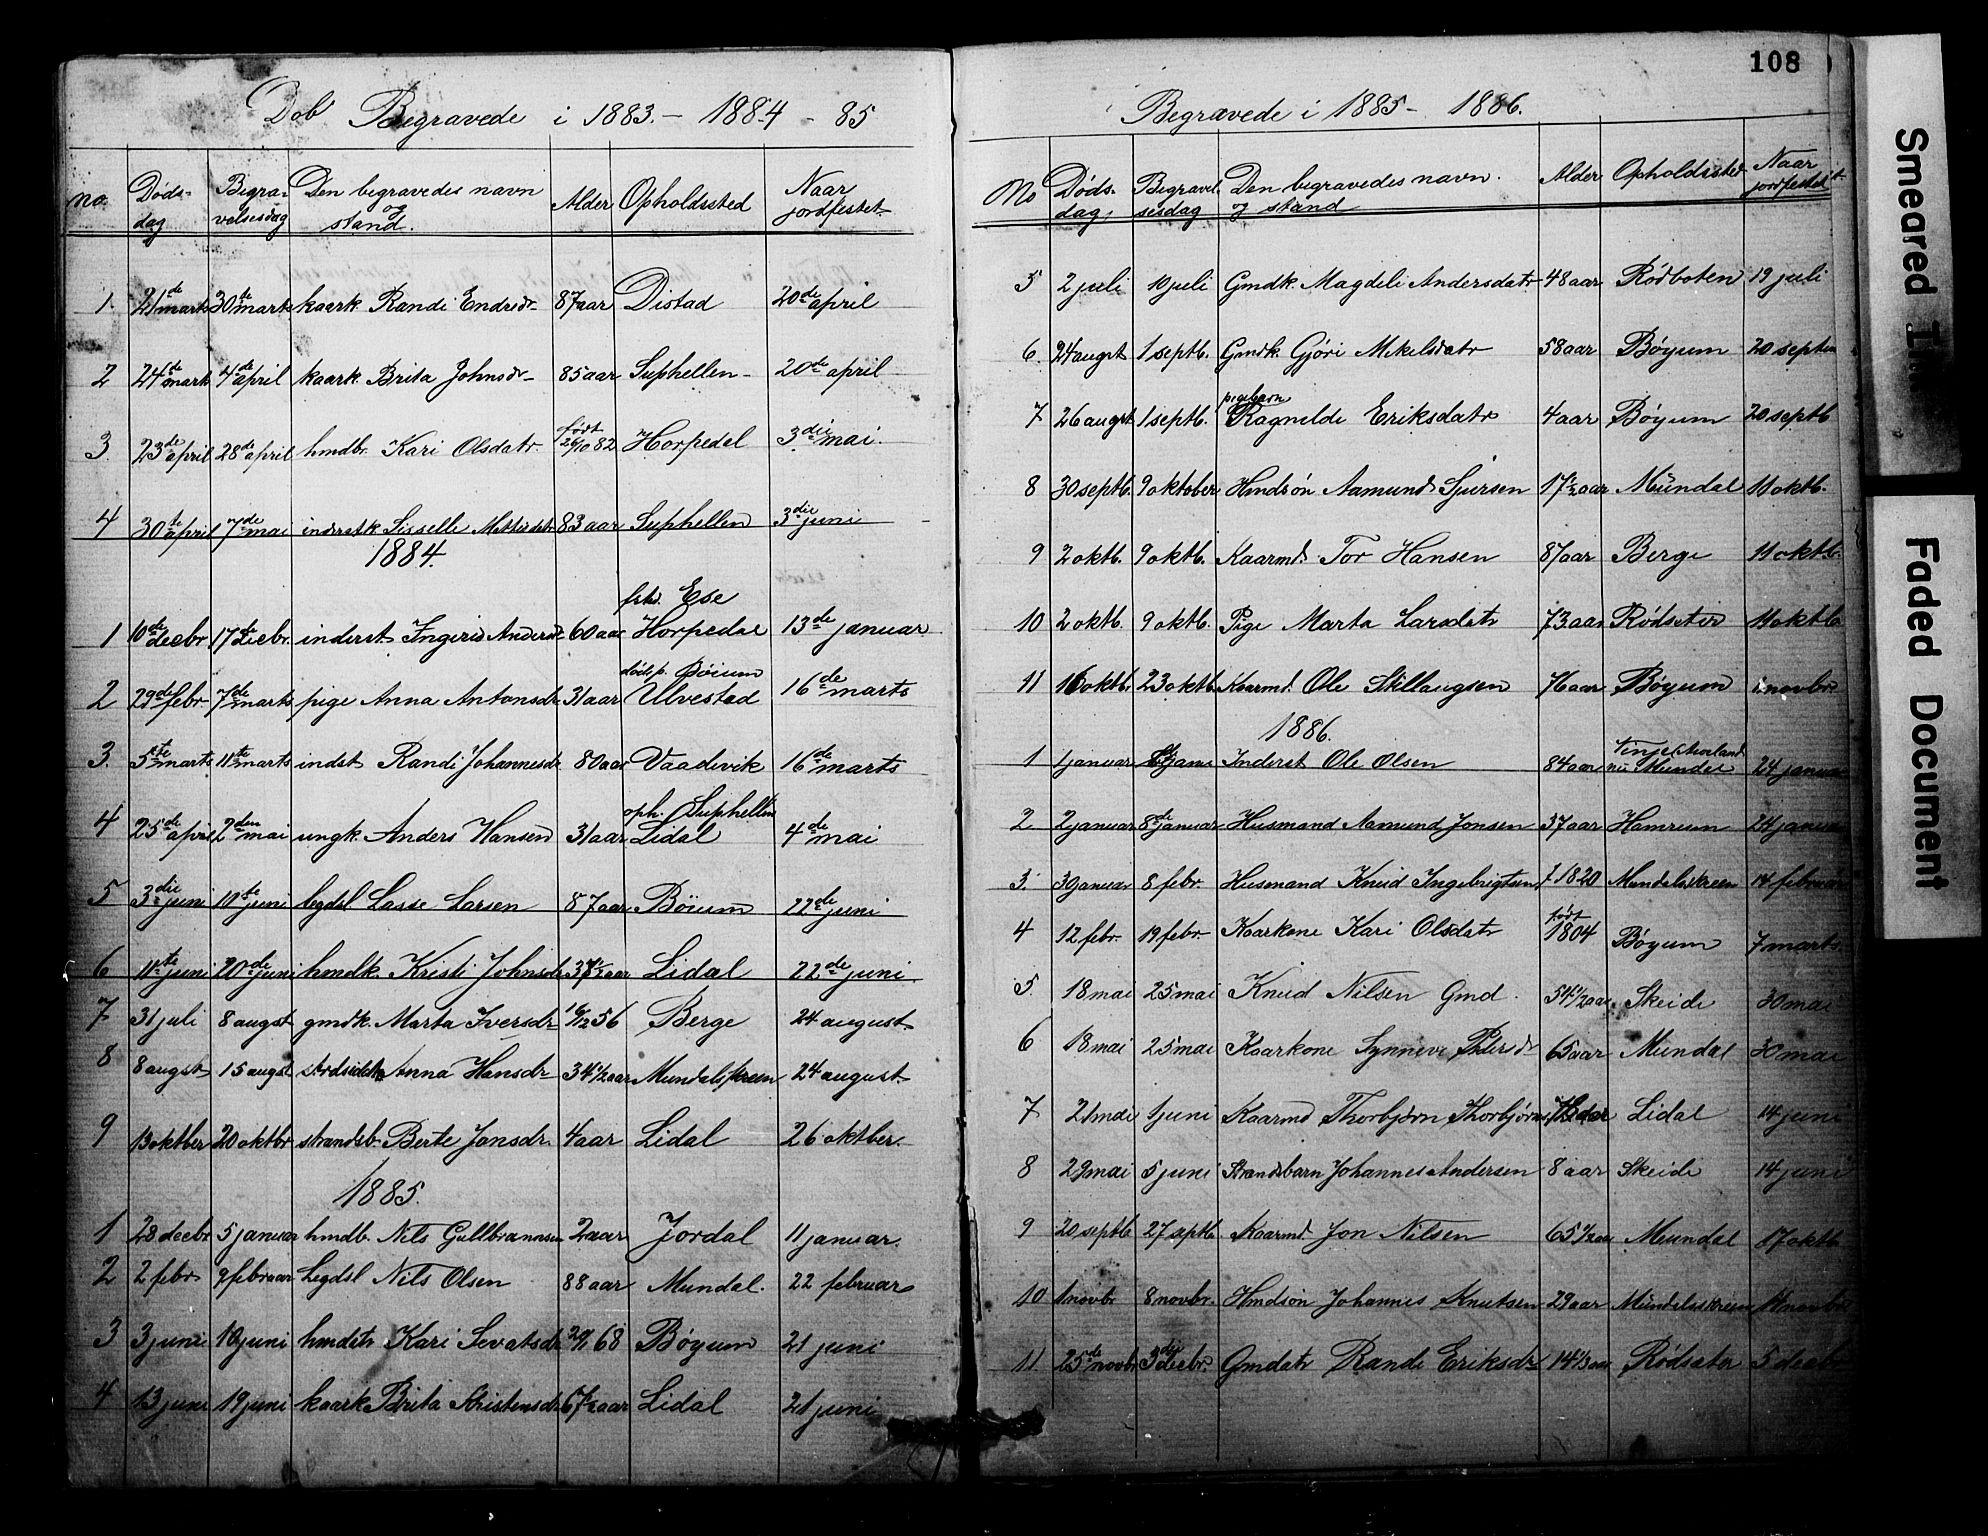 SAB, Balestrand sokneprestembete, Klokkerbok nr. B 1A, 1880-1916, s. 108